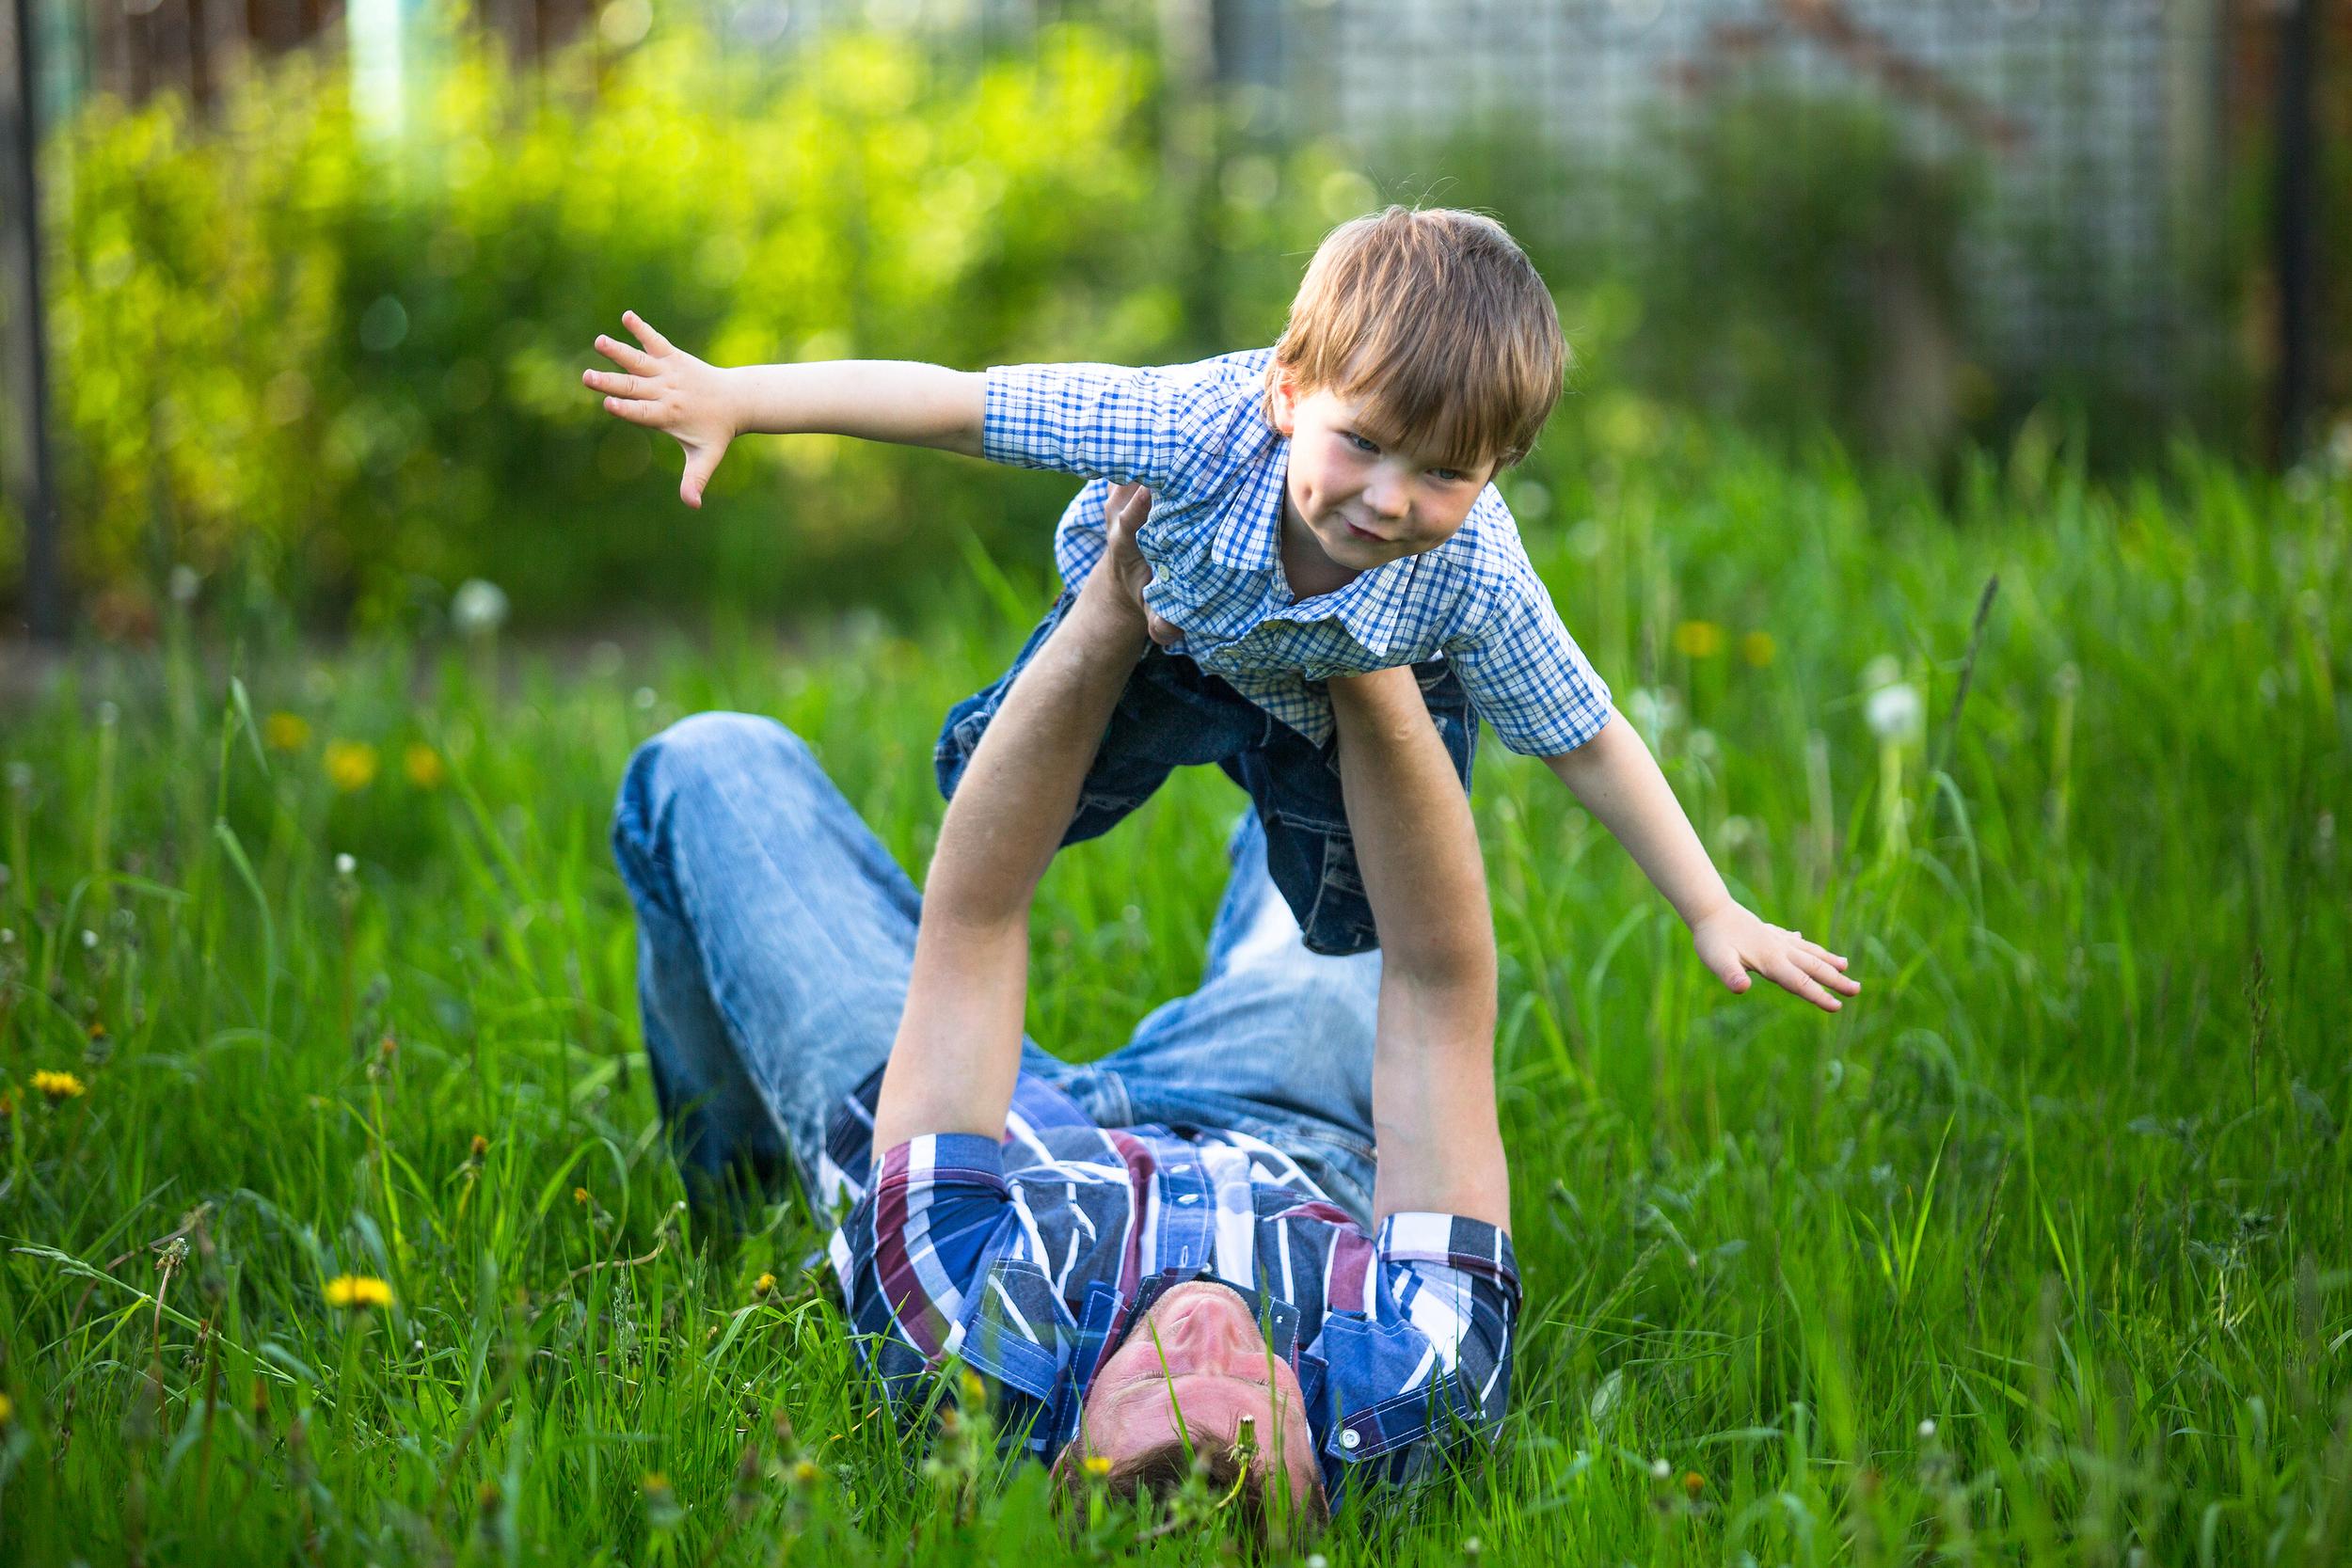 bigstock-Father-and-son-playing-lying-o-46173241.jpg